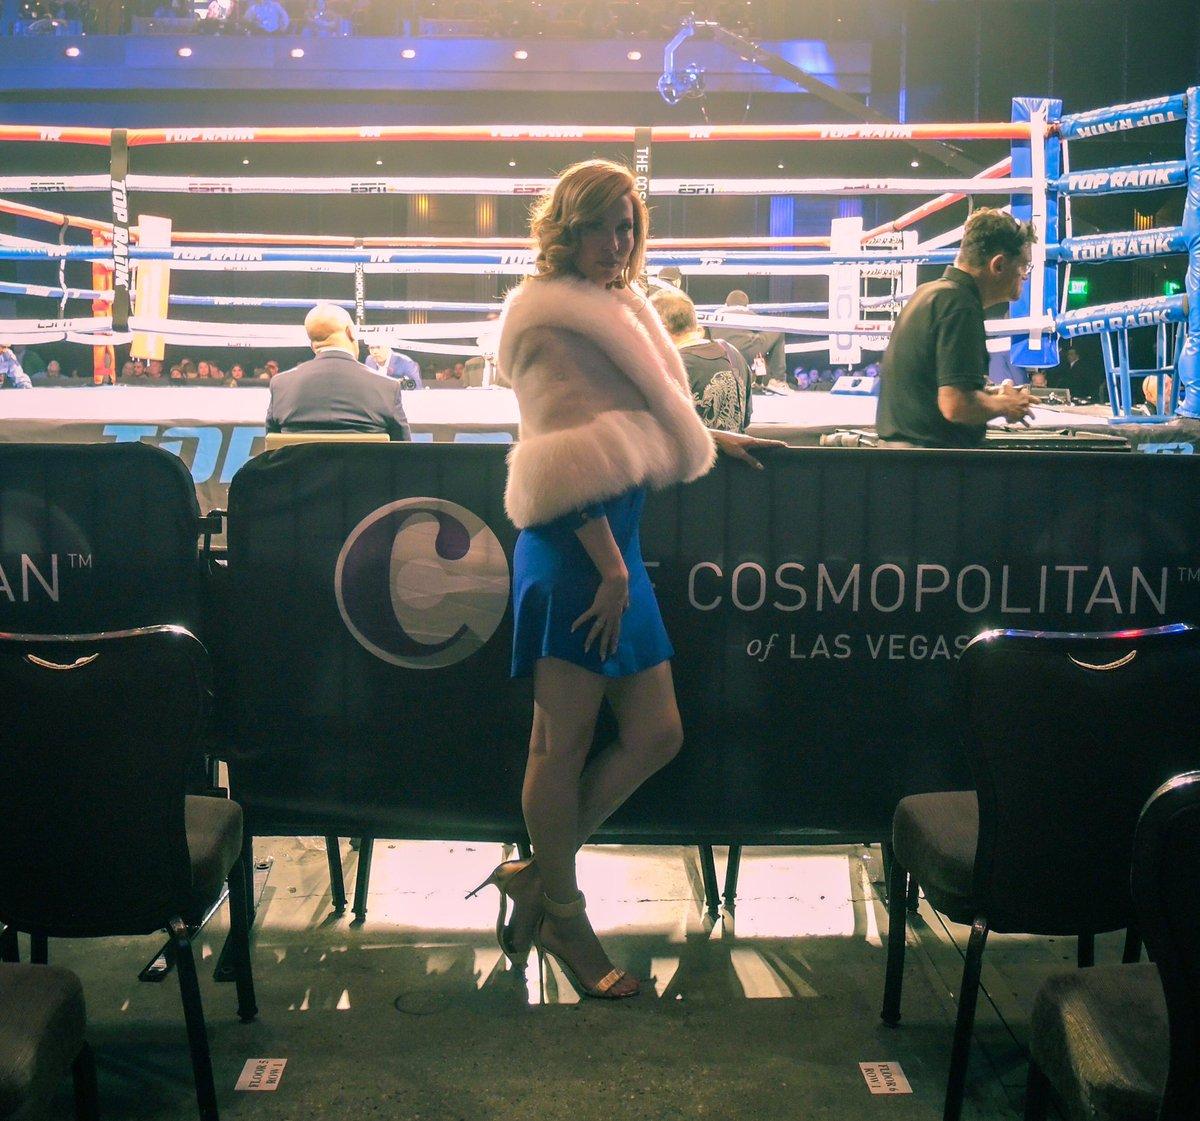 Love my new Aquazurra shoes - so comfortable and pretty! saturdaynight #fightnight #boxing #cosmopolitanlasvegas #livinginlasvegas #lasvegaslifestyle #lifeinlasvegas #aquazurrashoes @aquazzura – at The Cosmopolitan of Las Vegas